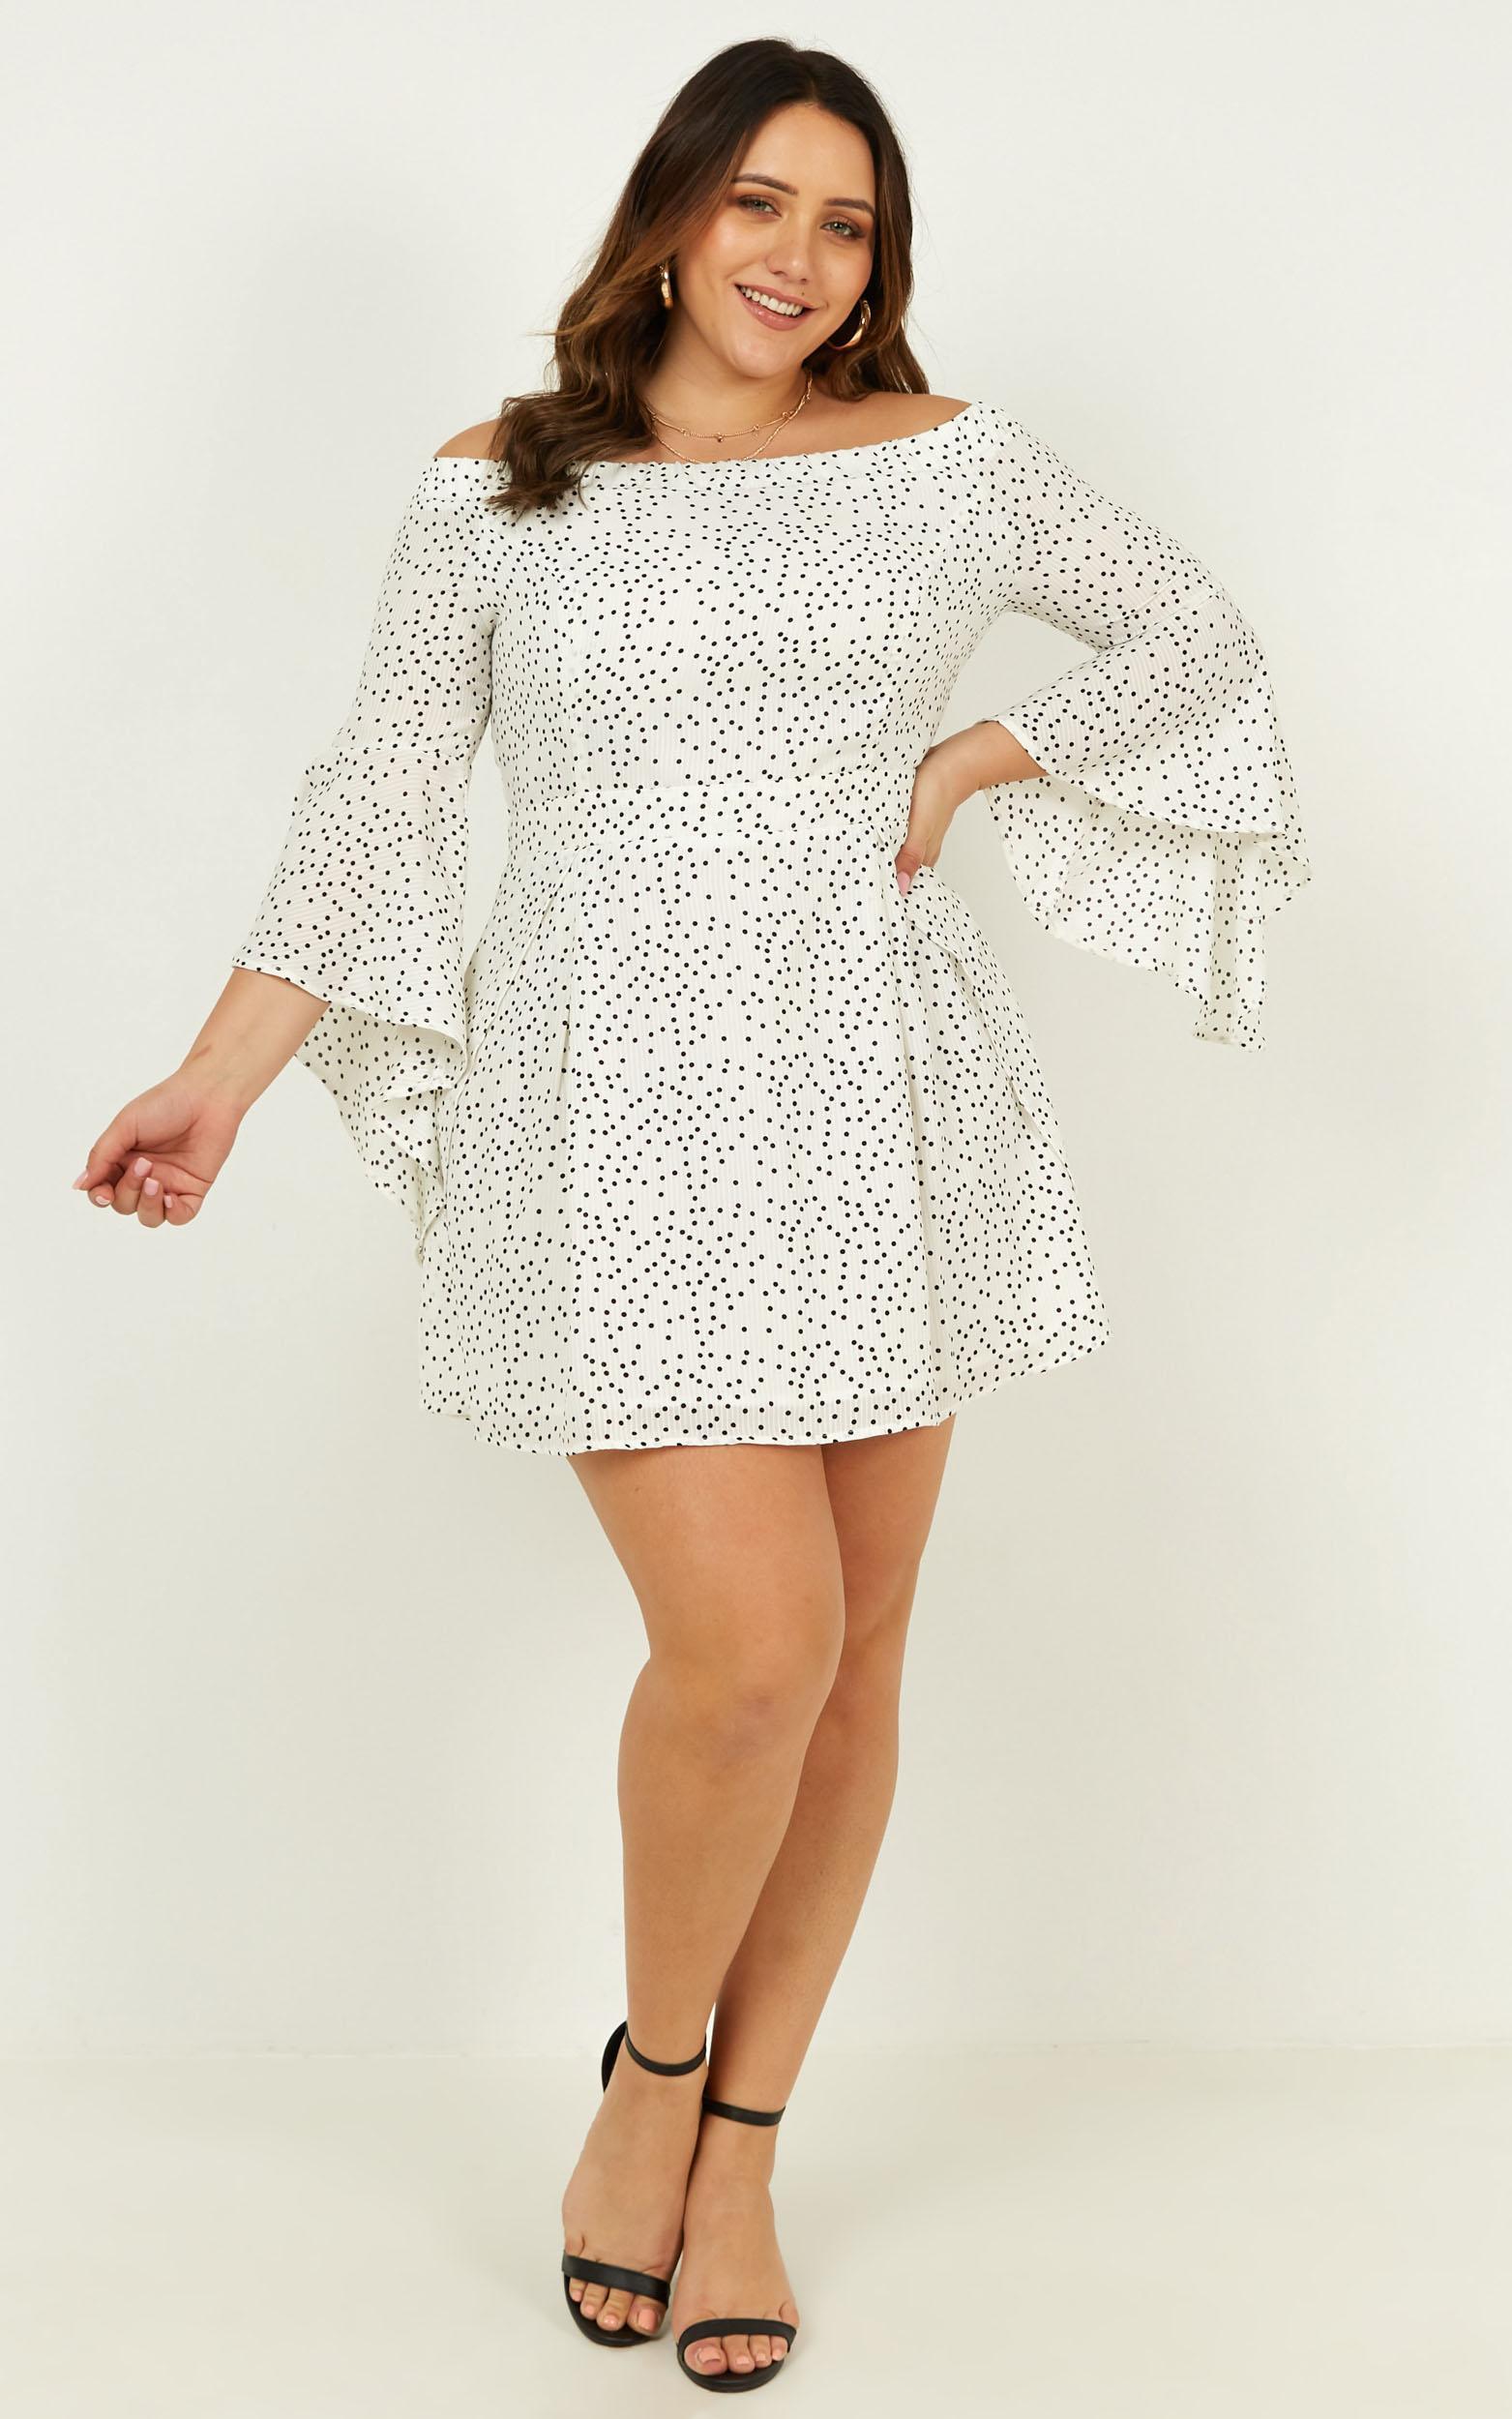 Break my Heart Dress in white spot - 20 (XXXXL), WHT1, hi-res image number null